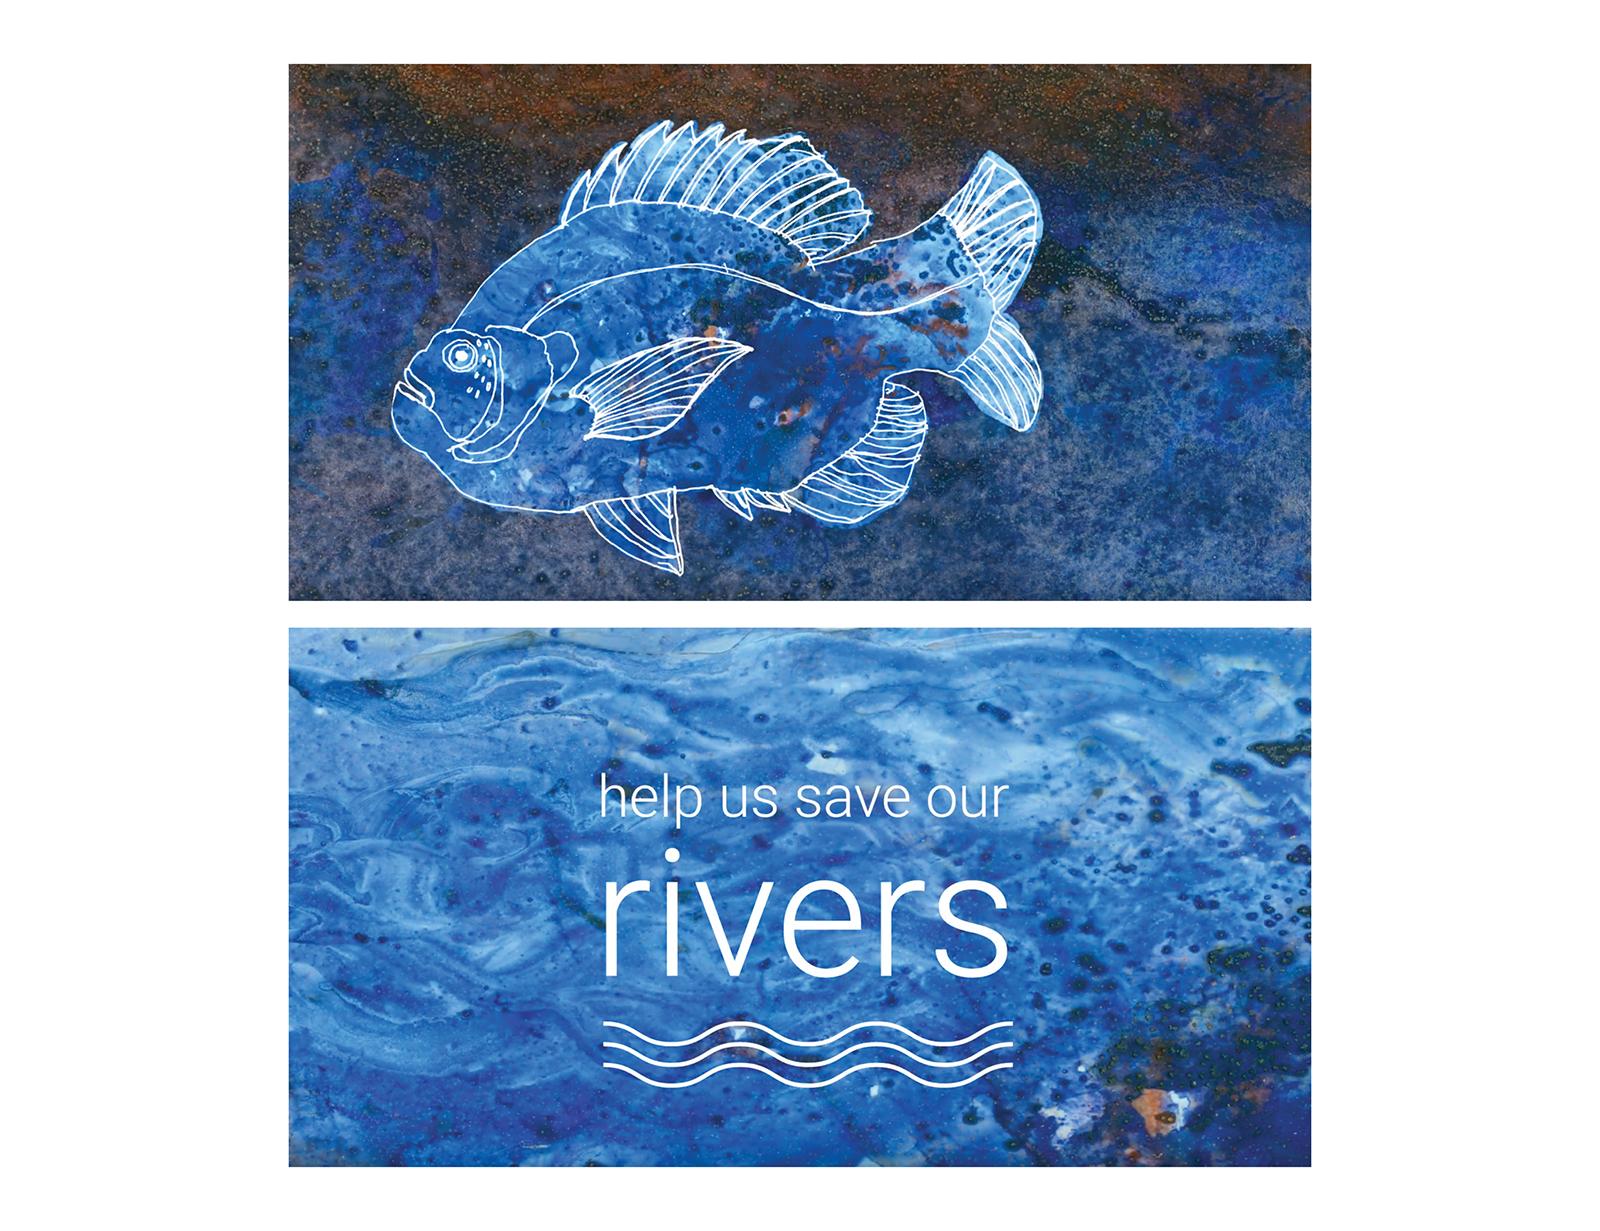 river alliance web page_april28.jpg